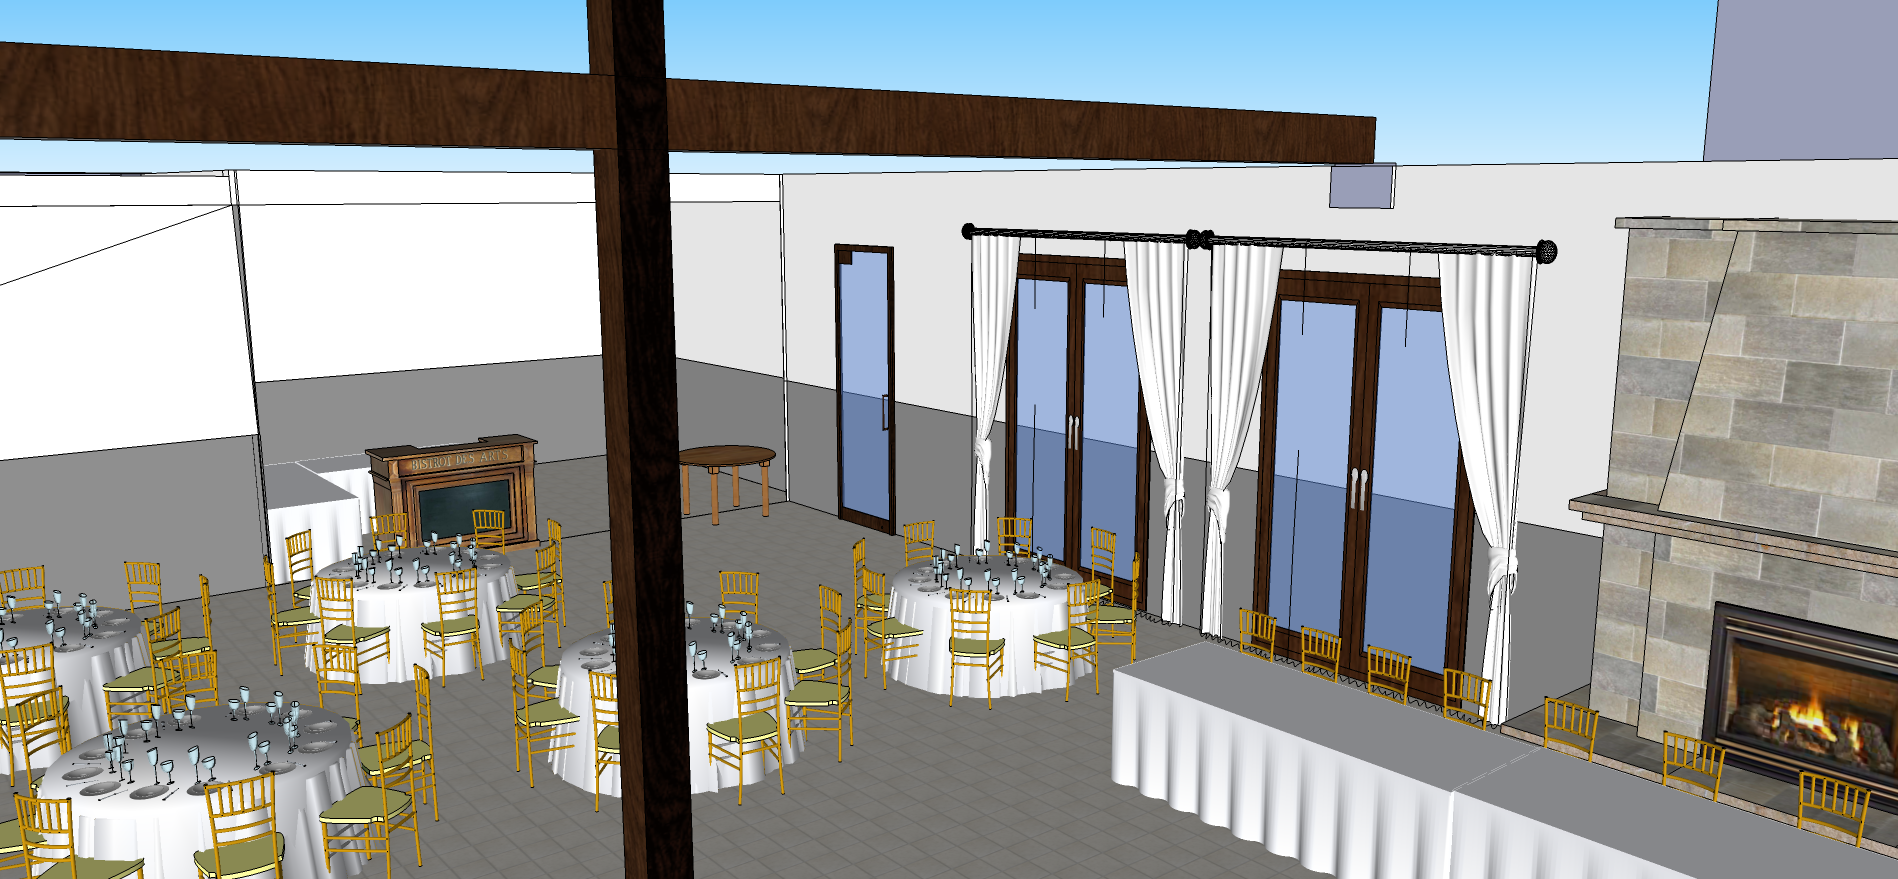 5.3.2014 Malcom Layout Bar Area sketch.png